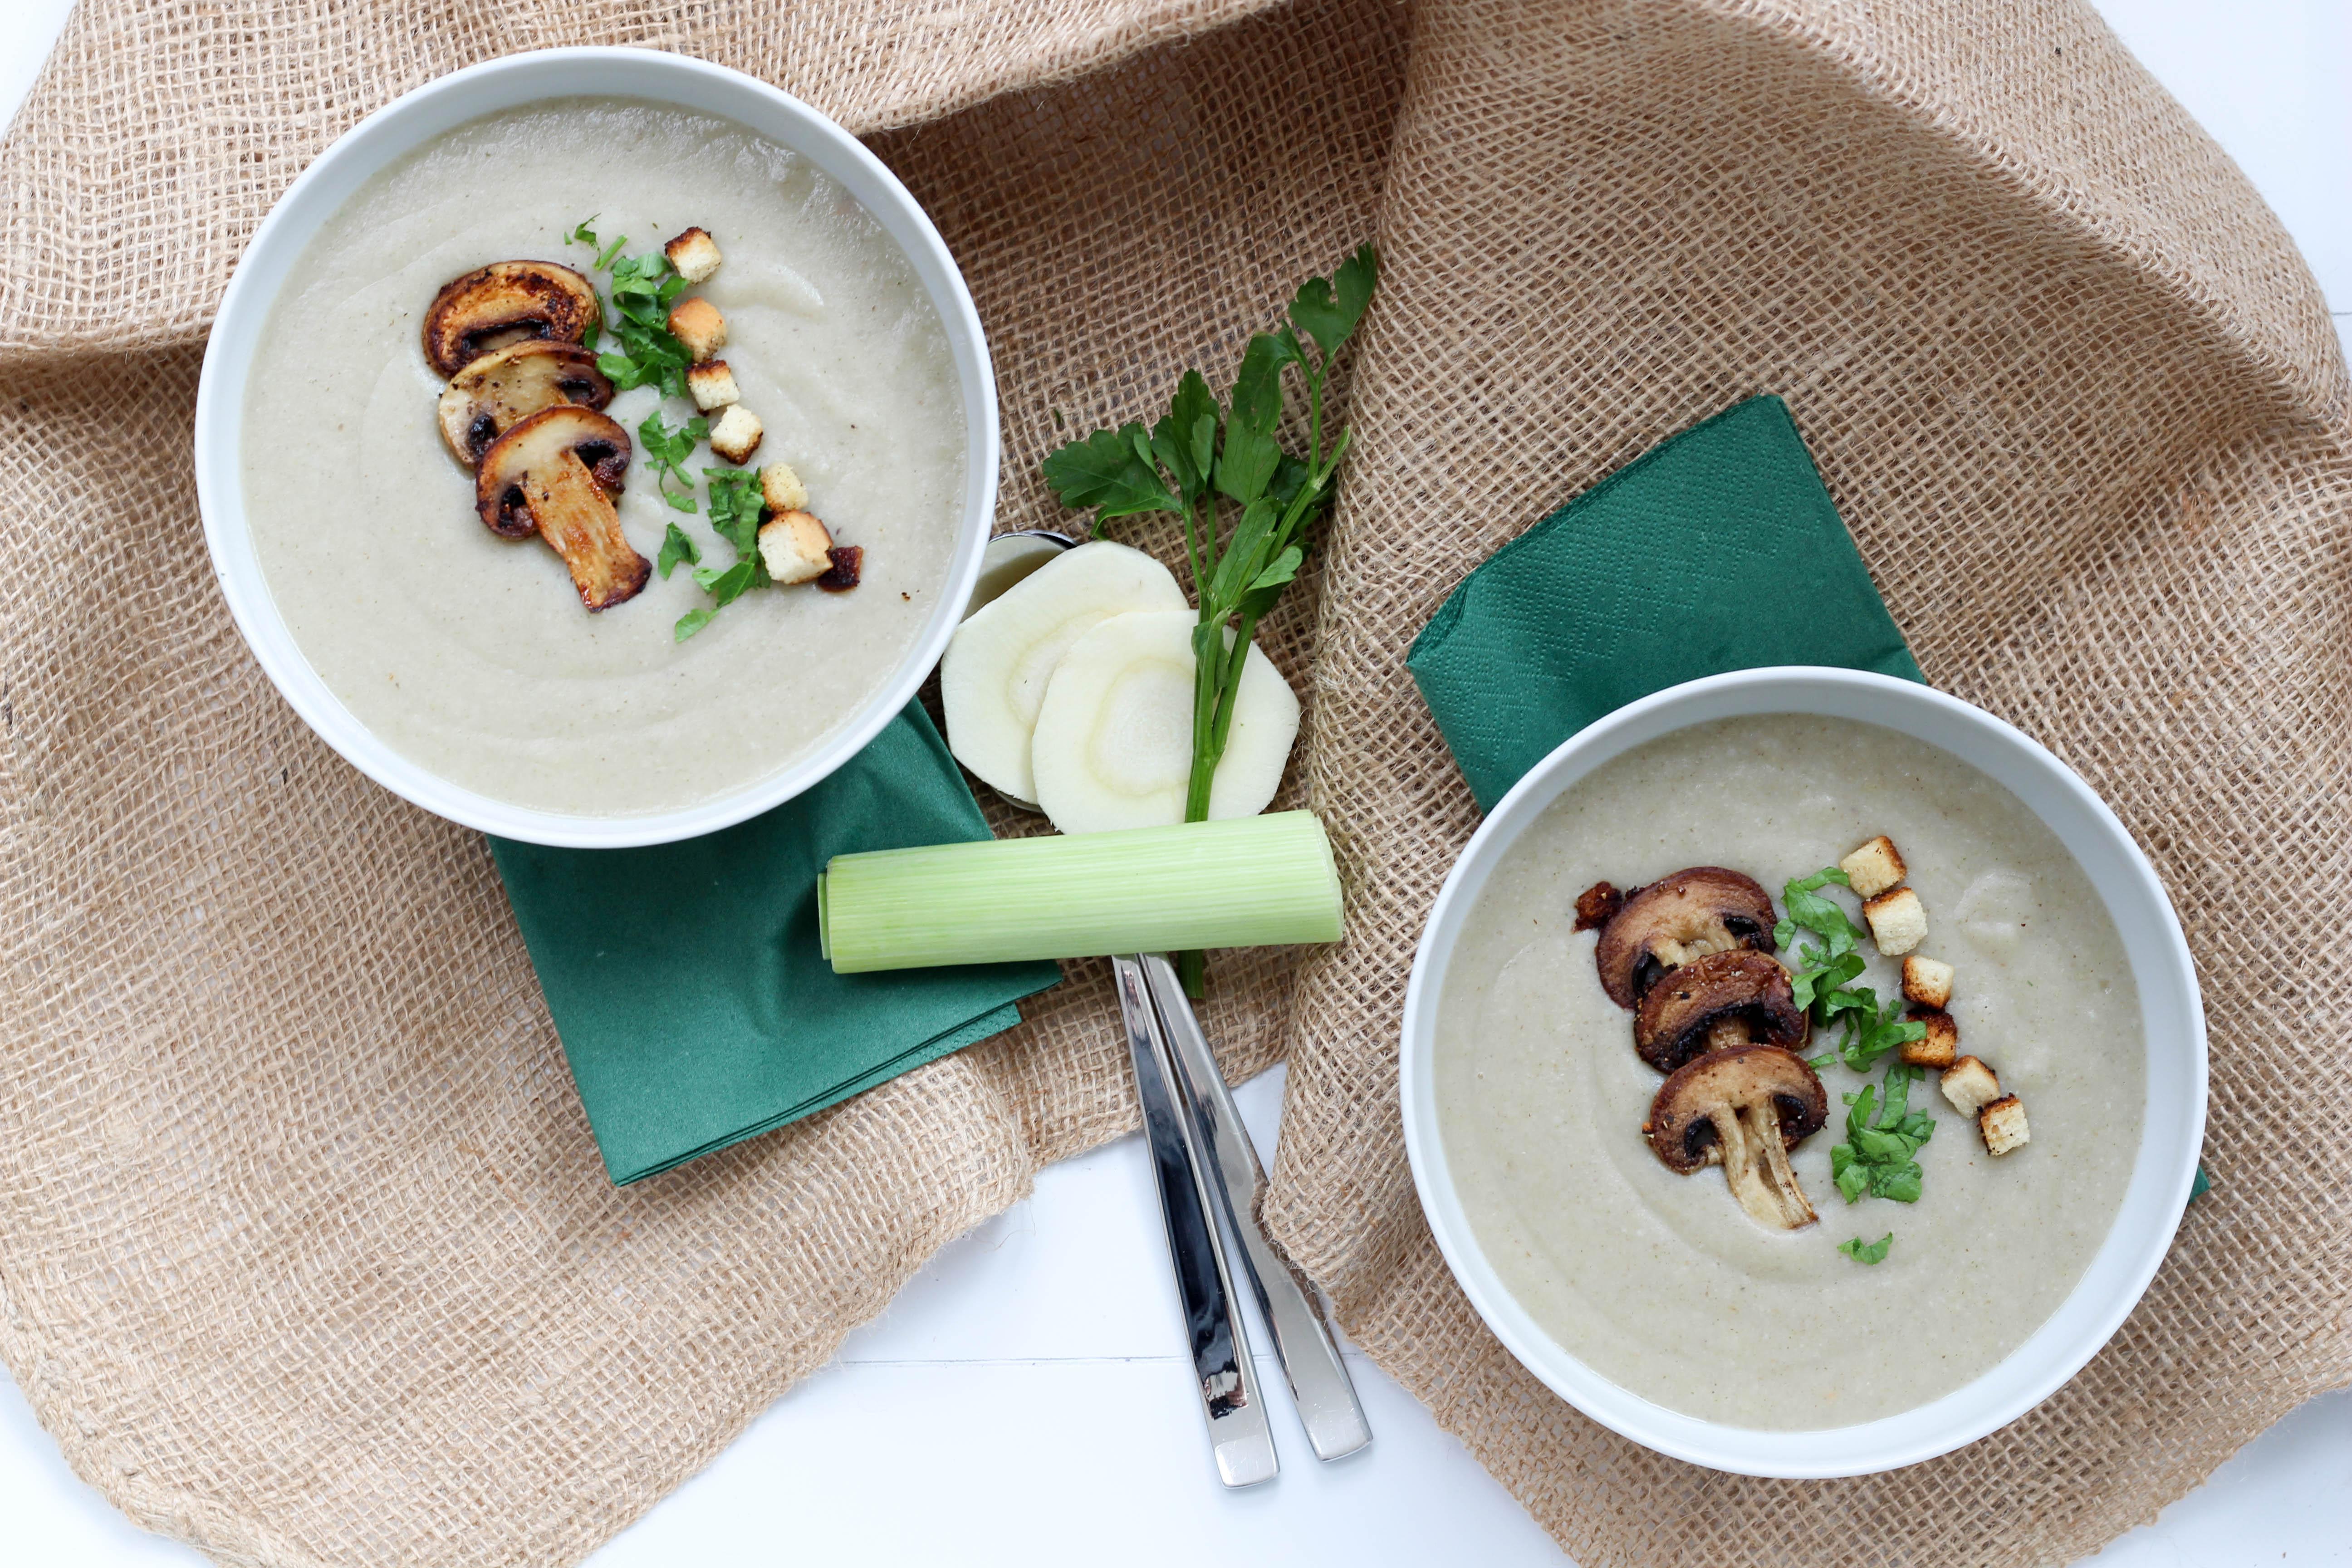 Dein Homespa - Vegan - Plantbased - Healthy - Lifestyle - Champignoncreme Suppe - Quendel